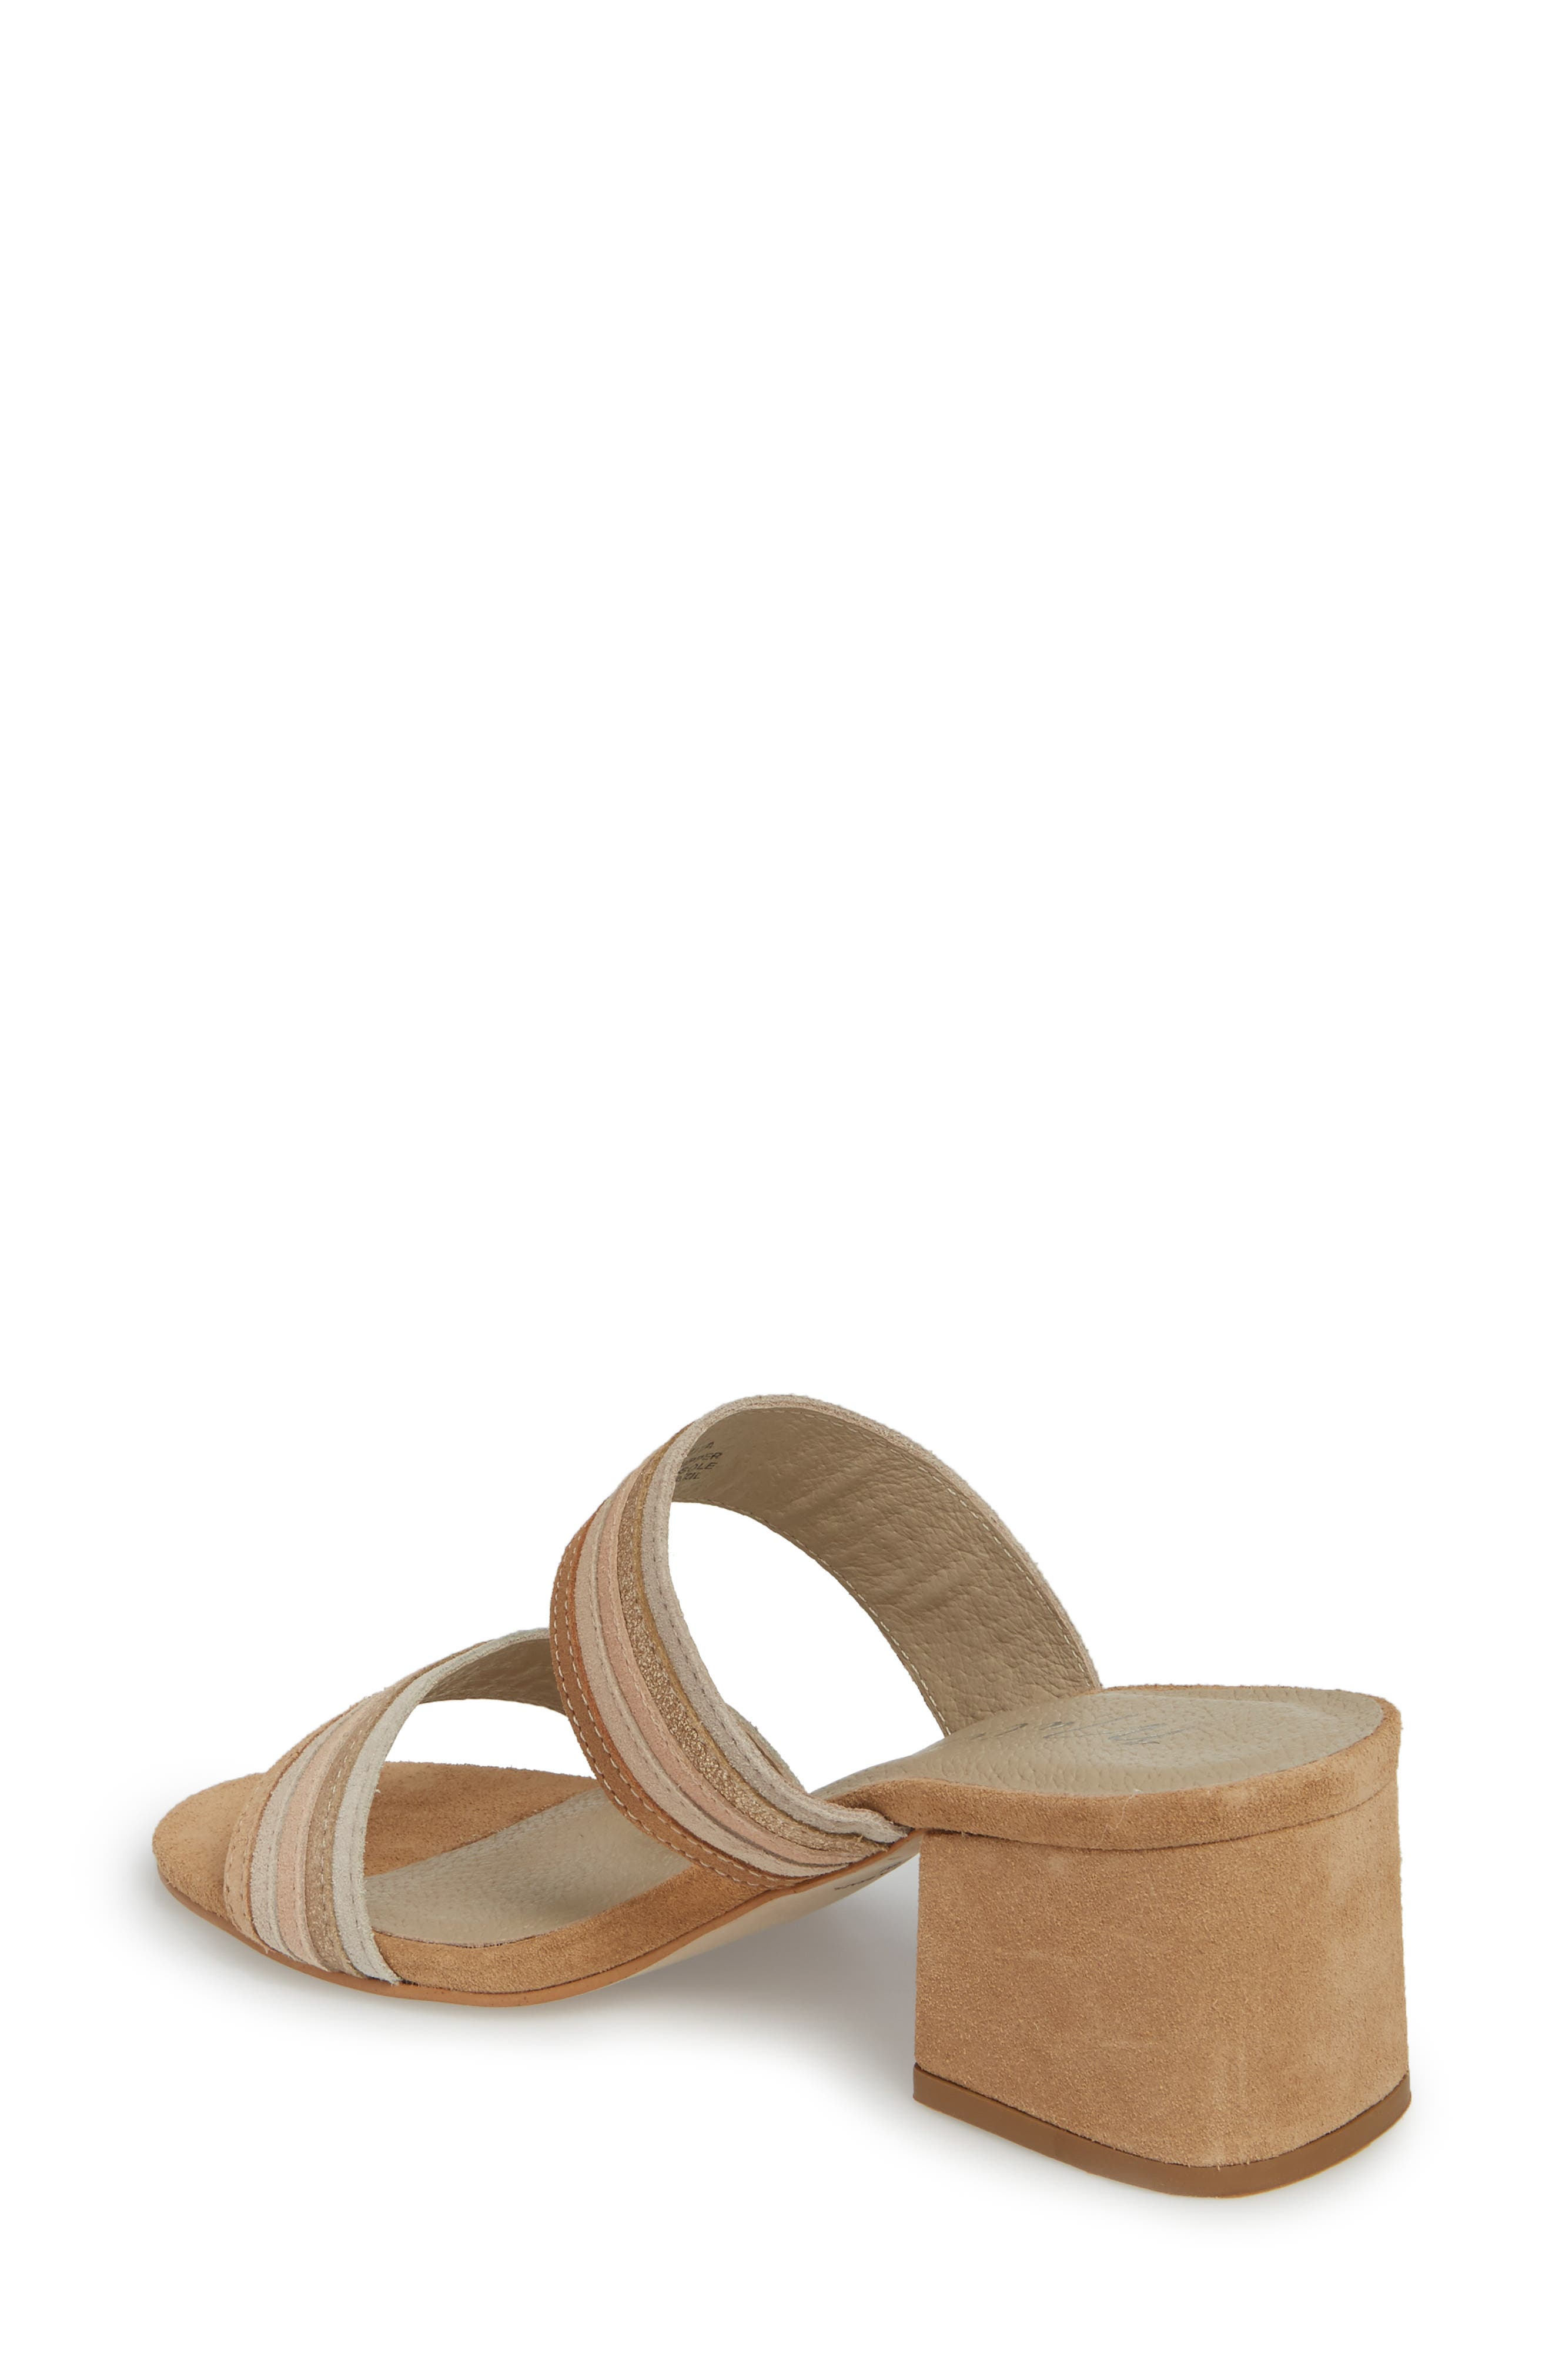 Bonita Slide Sandal,                             Alternate thumbnail 2, color,                             NATURAL SUEDE